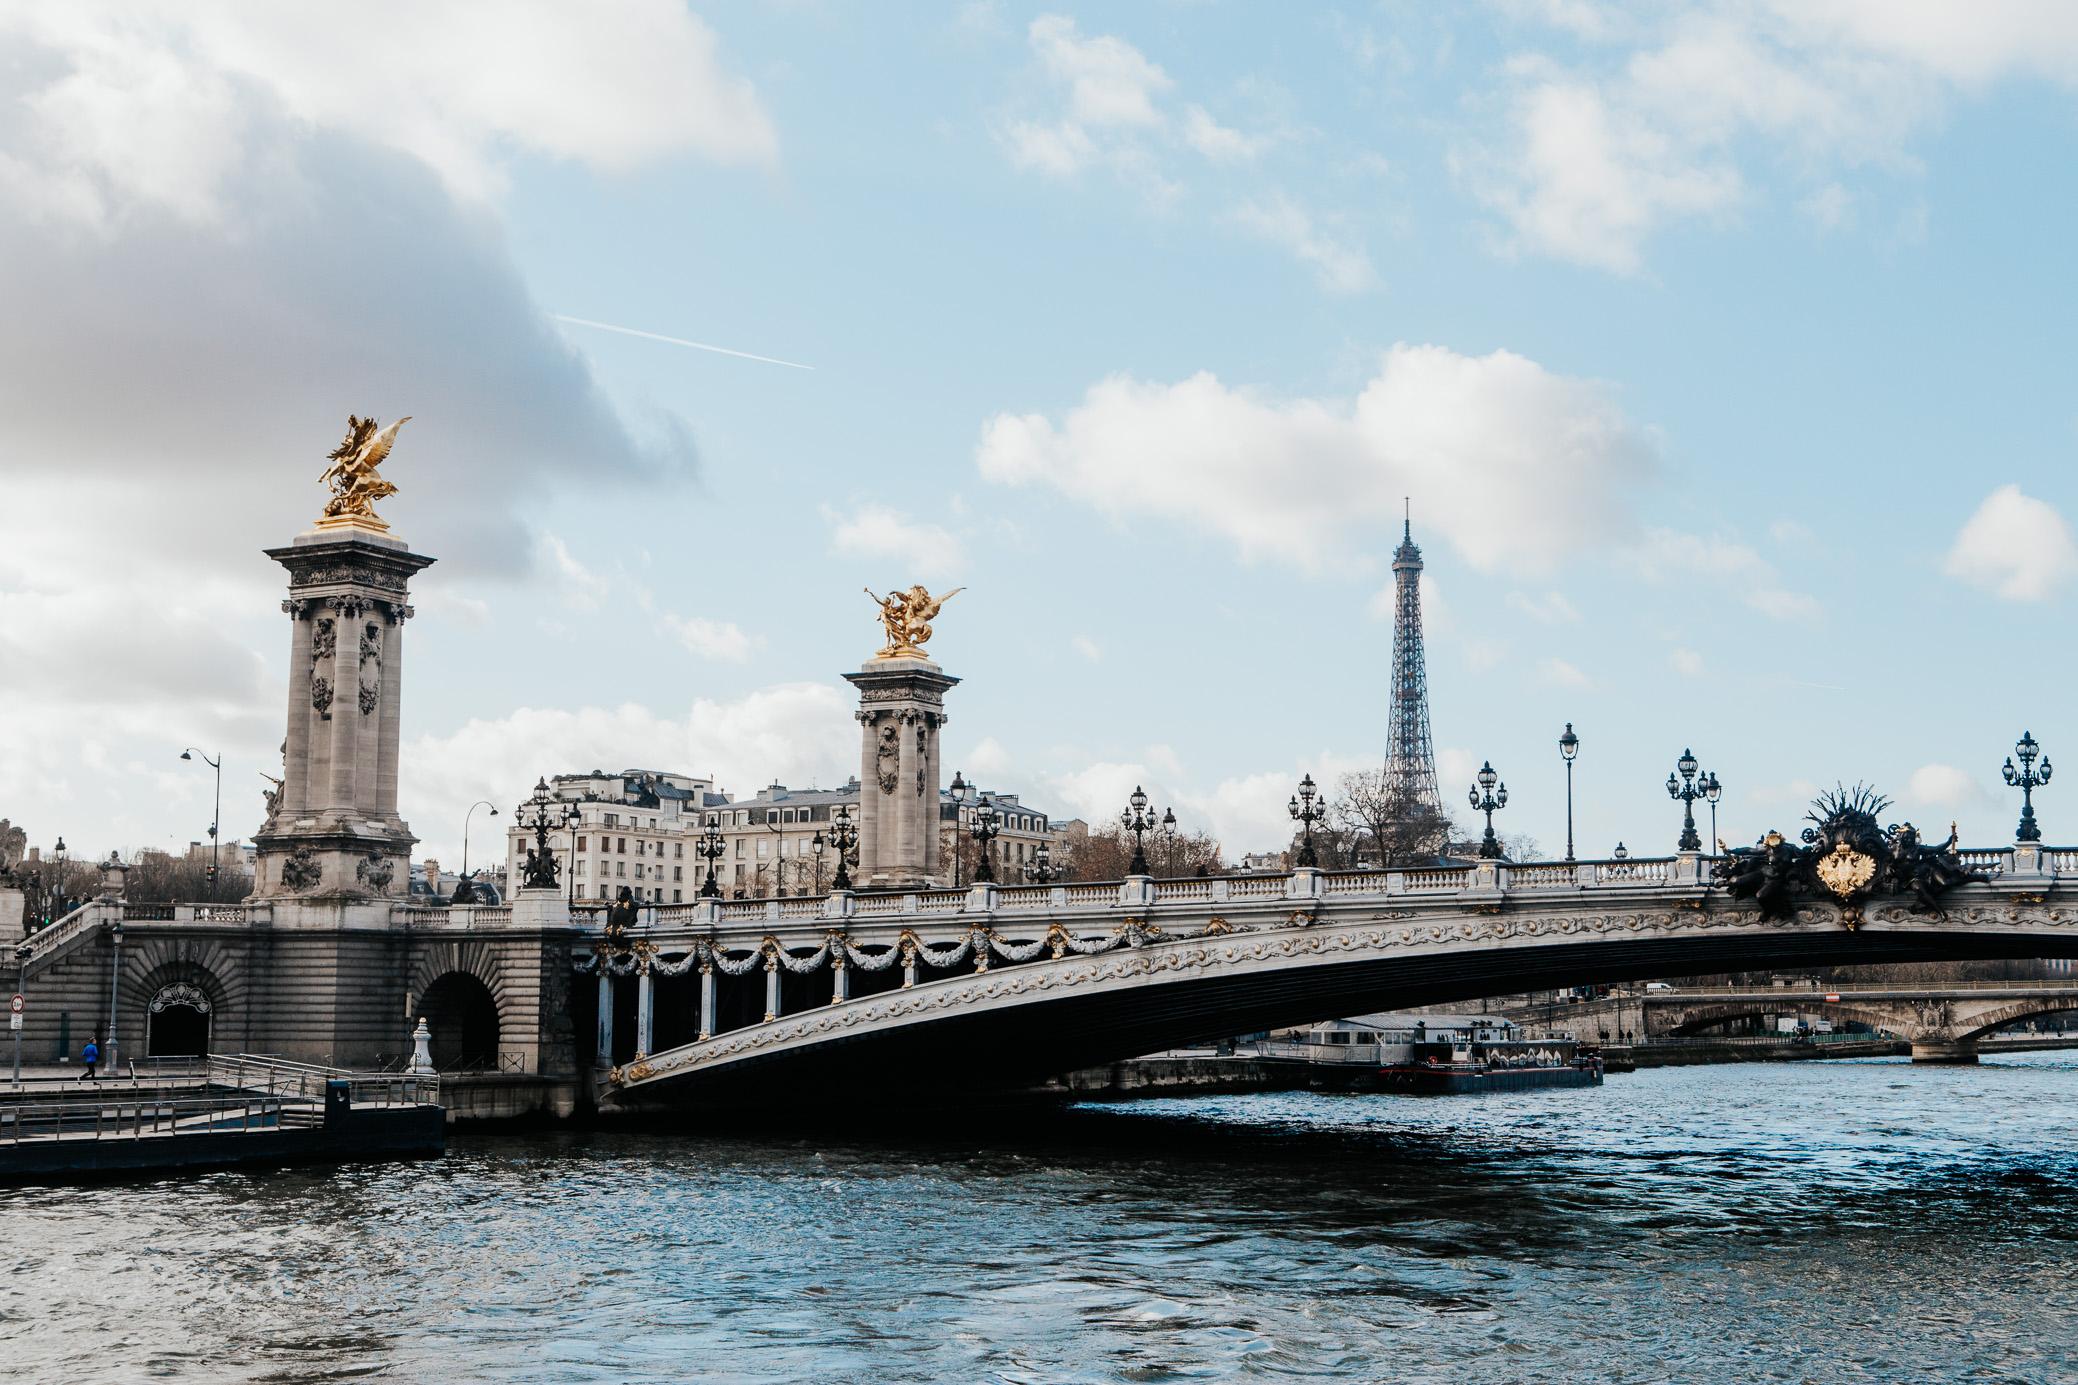 The Seine | Paris, France | December 10th, 2018 | (Photo by David A. Smith / DSmithScenes)